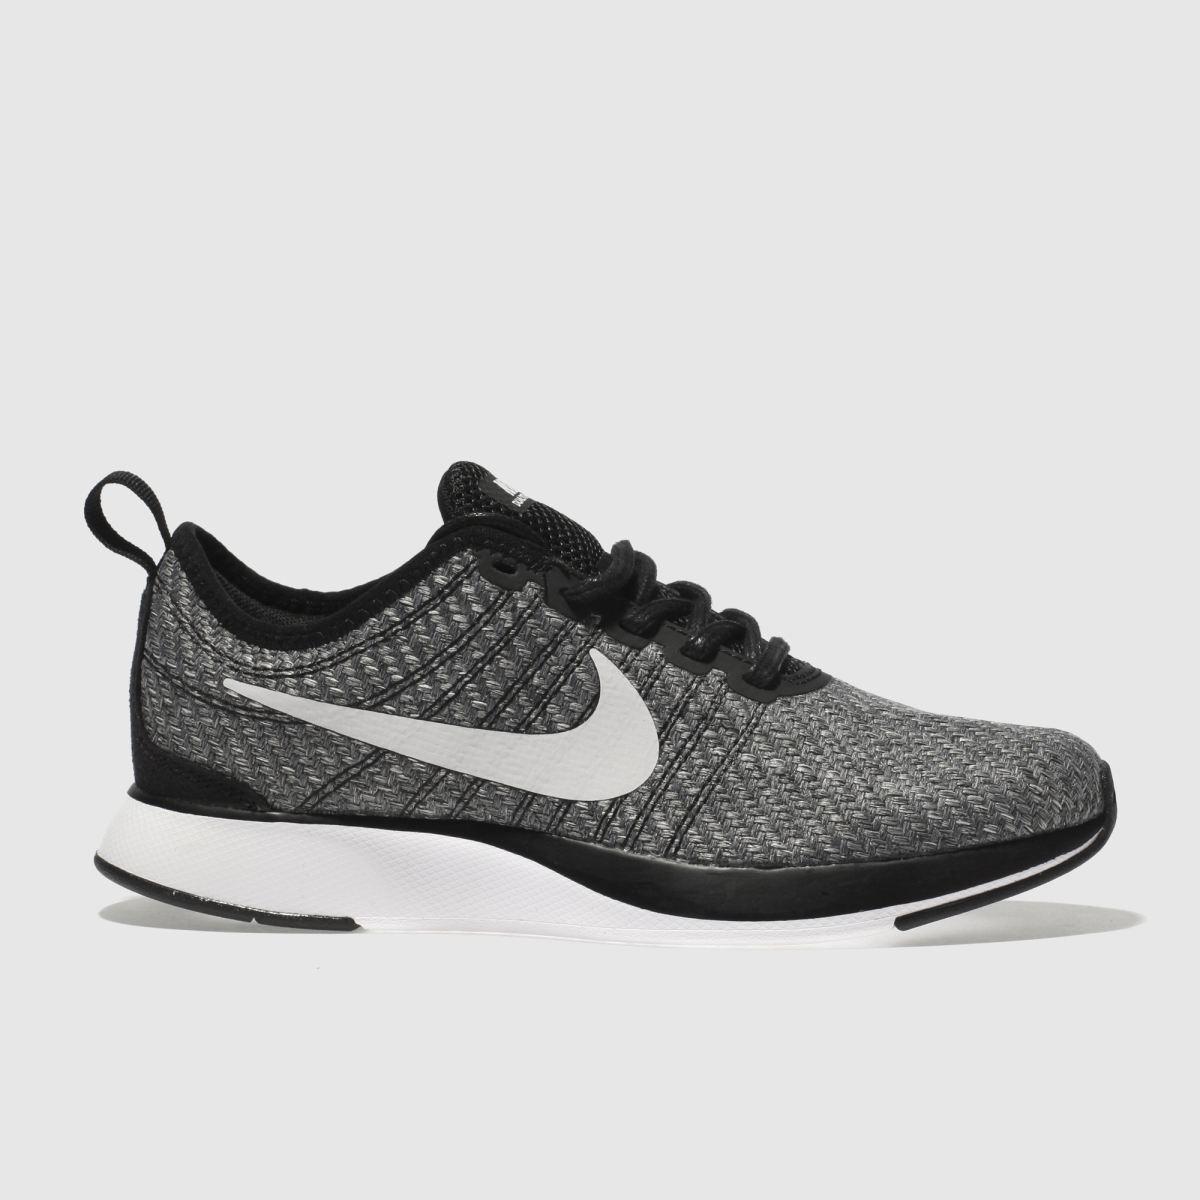 Nike Grey & Black Dualtone Racer Se Boys Youth Trainers